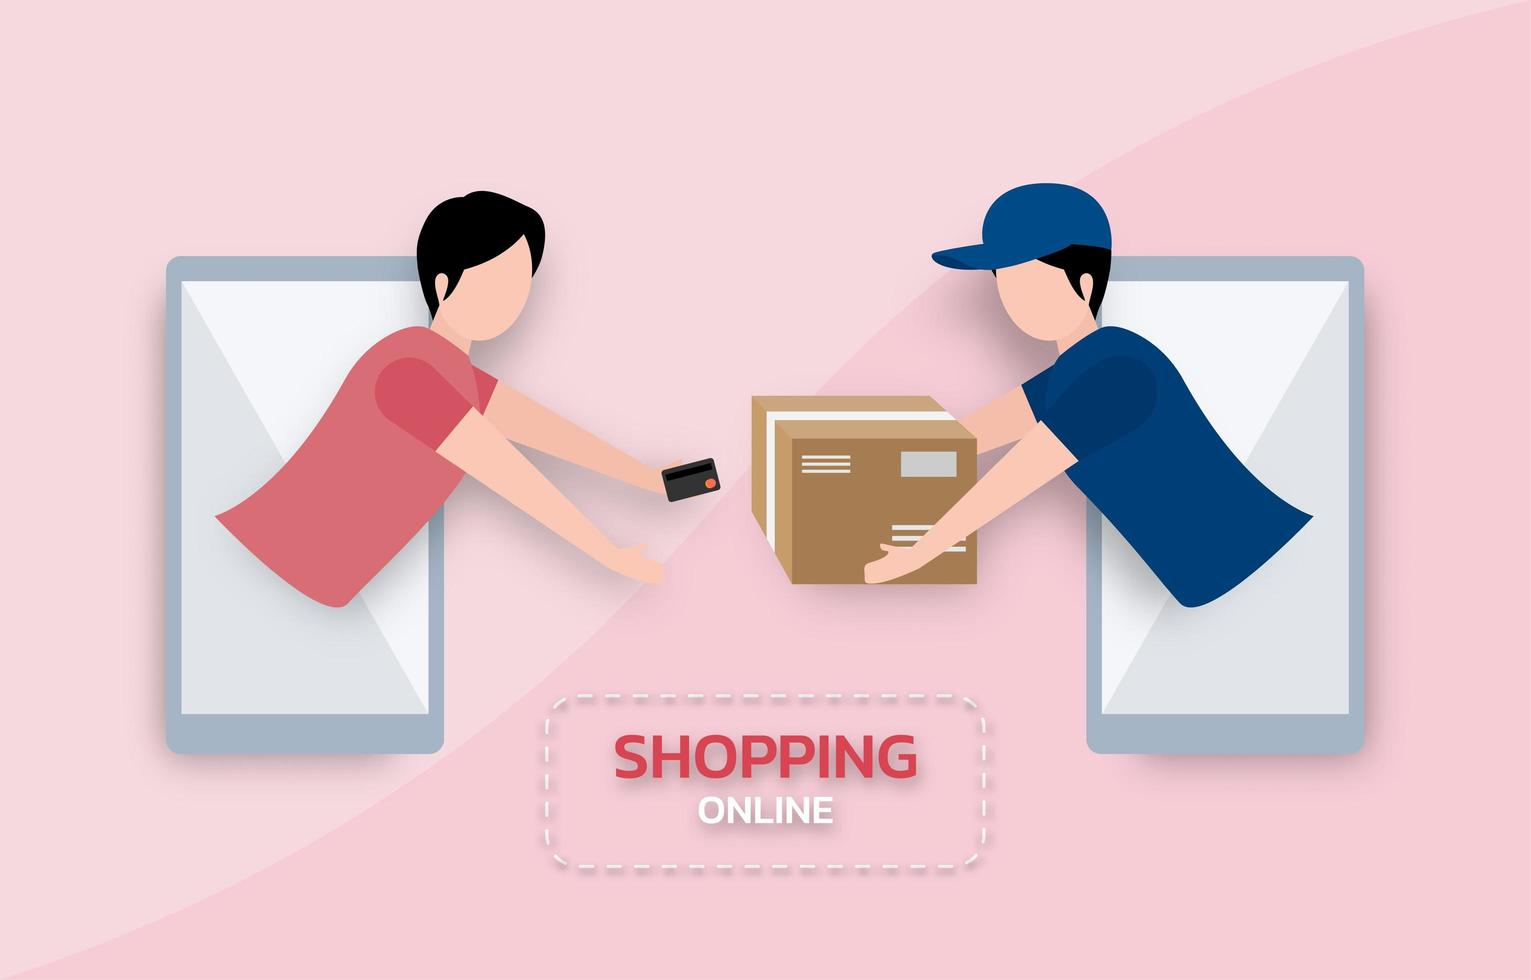 bedrijfsconcept e-commerce. online betalingsconcept vector